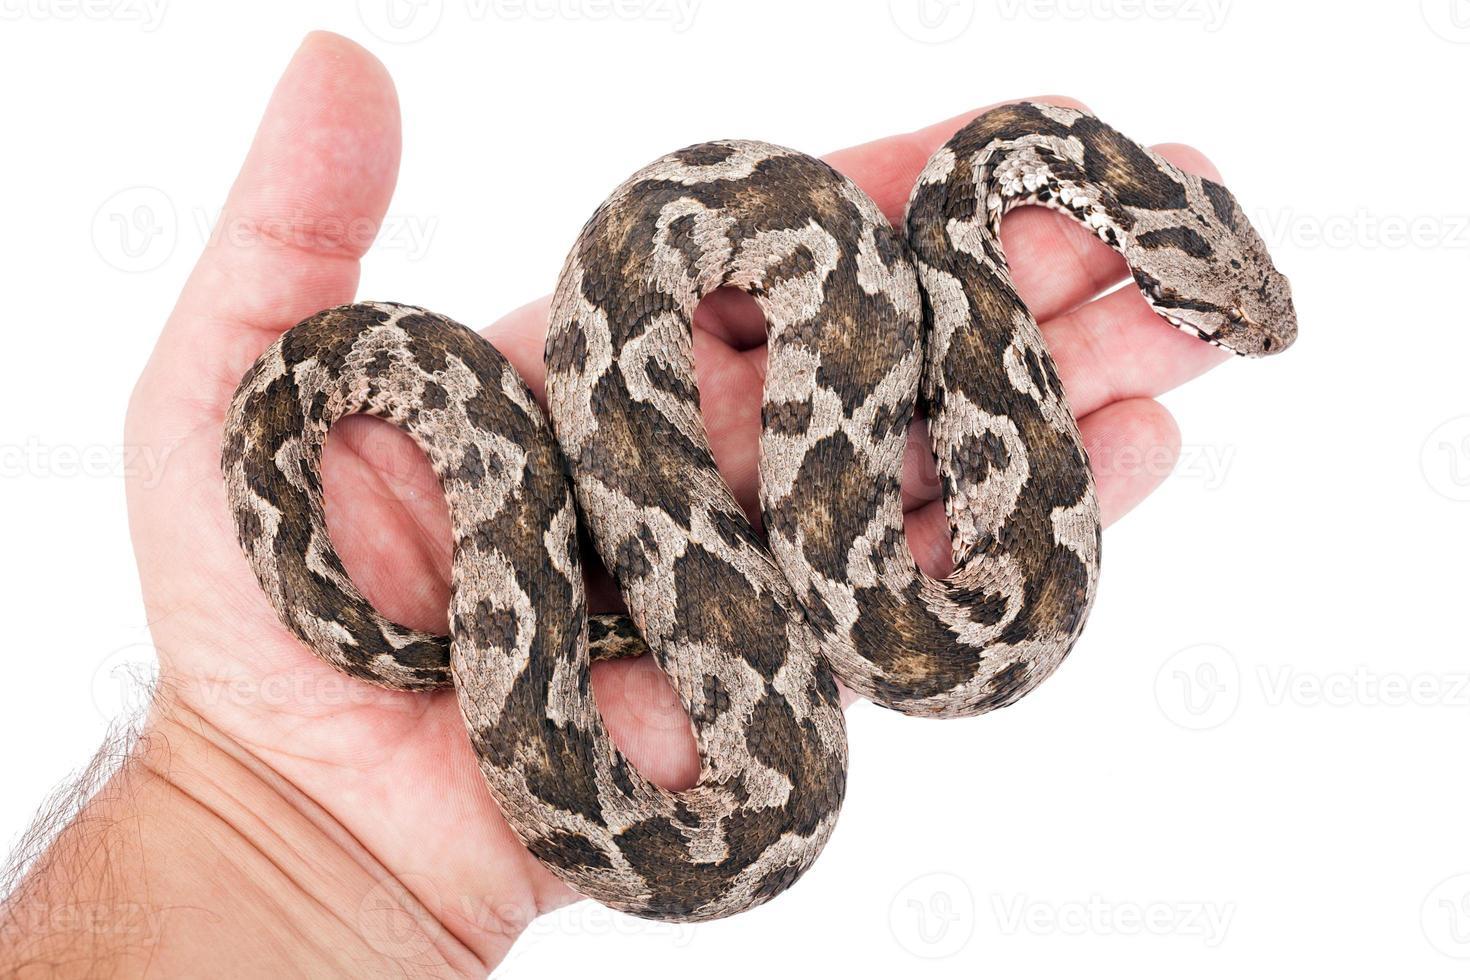 serpente vipera foto